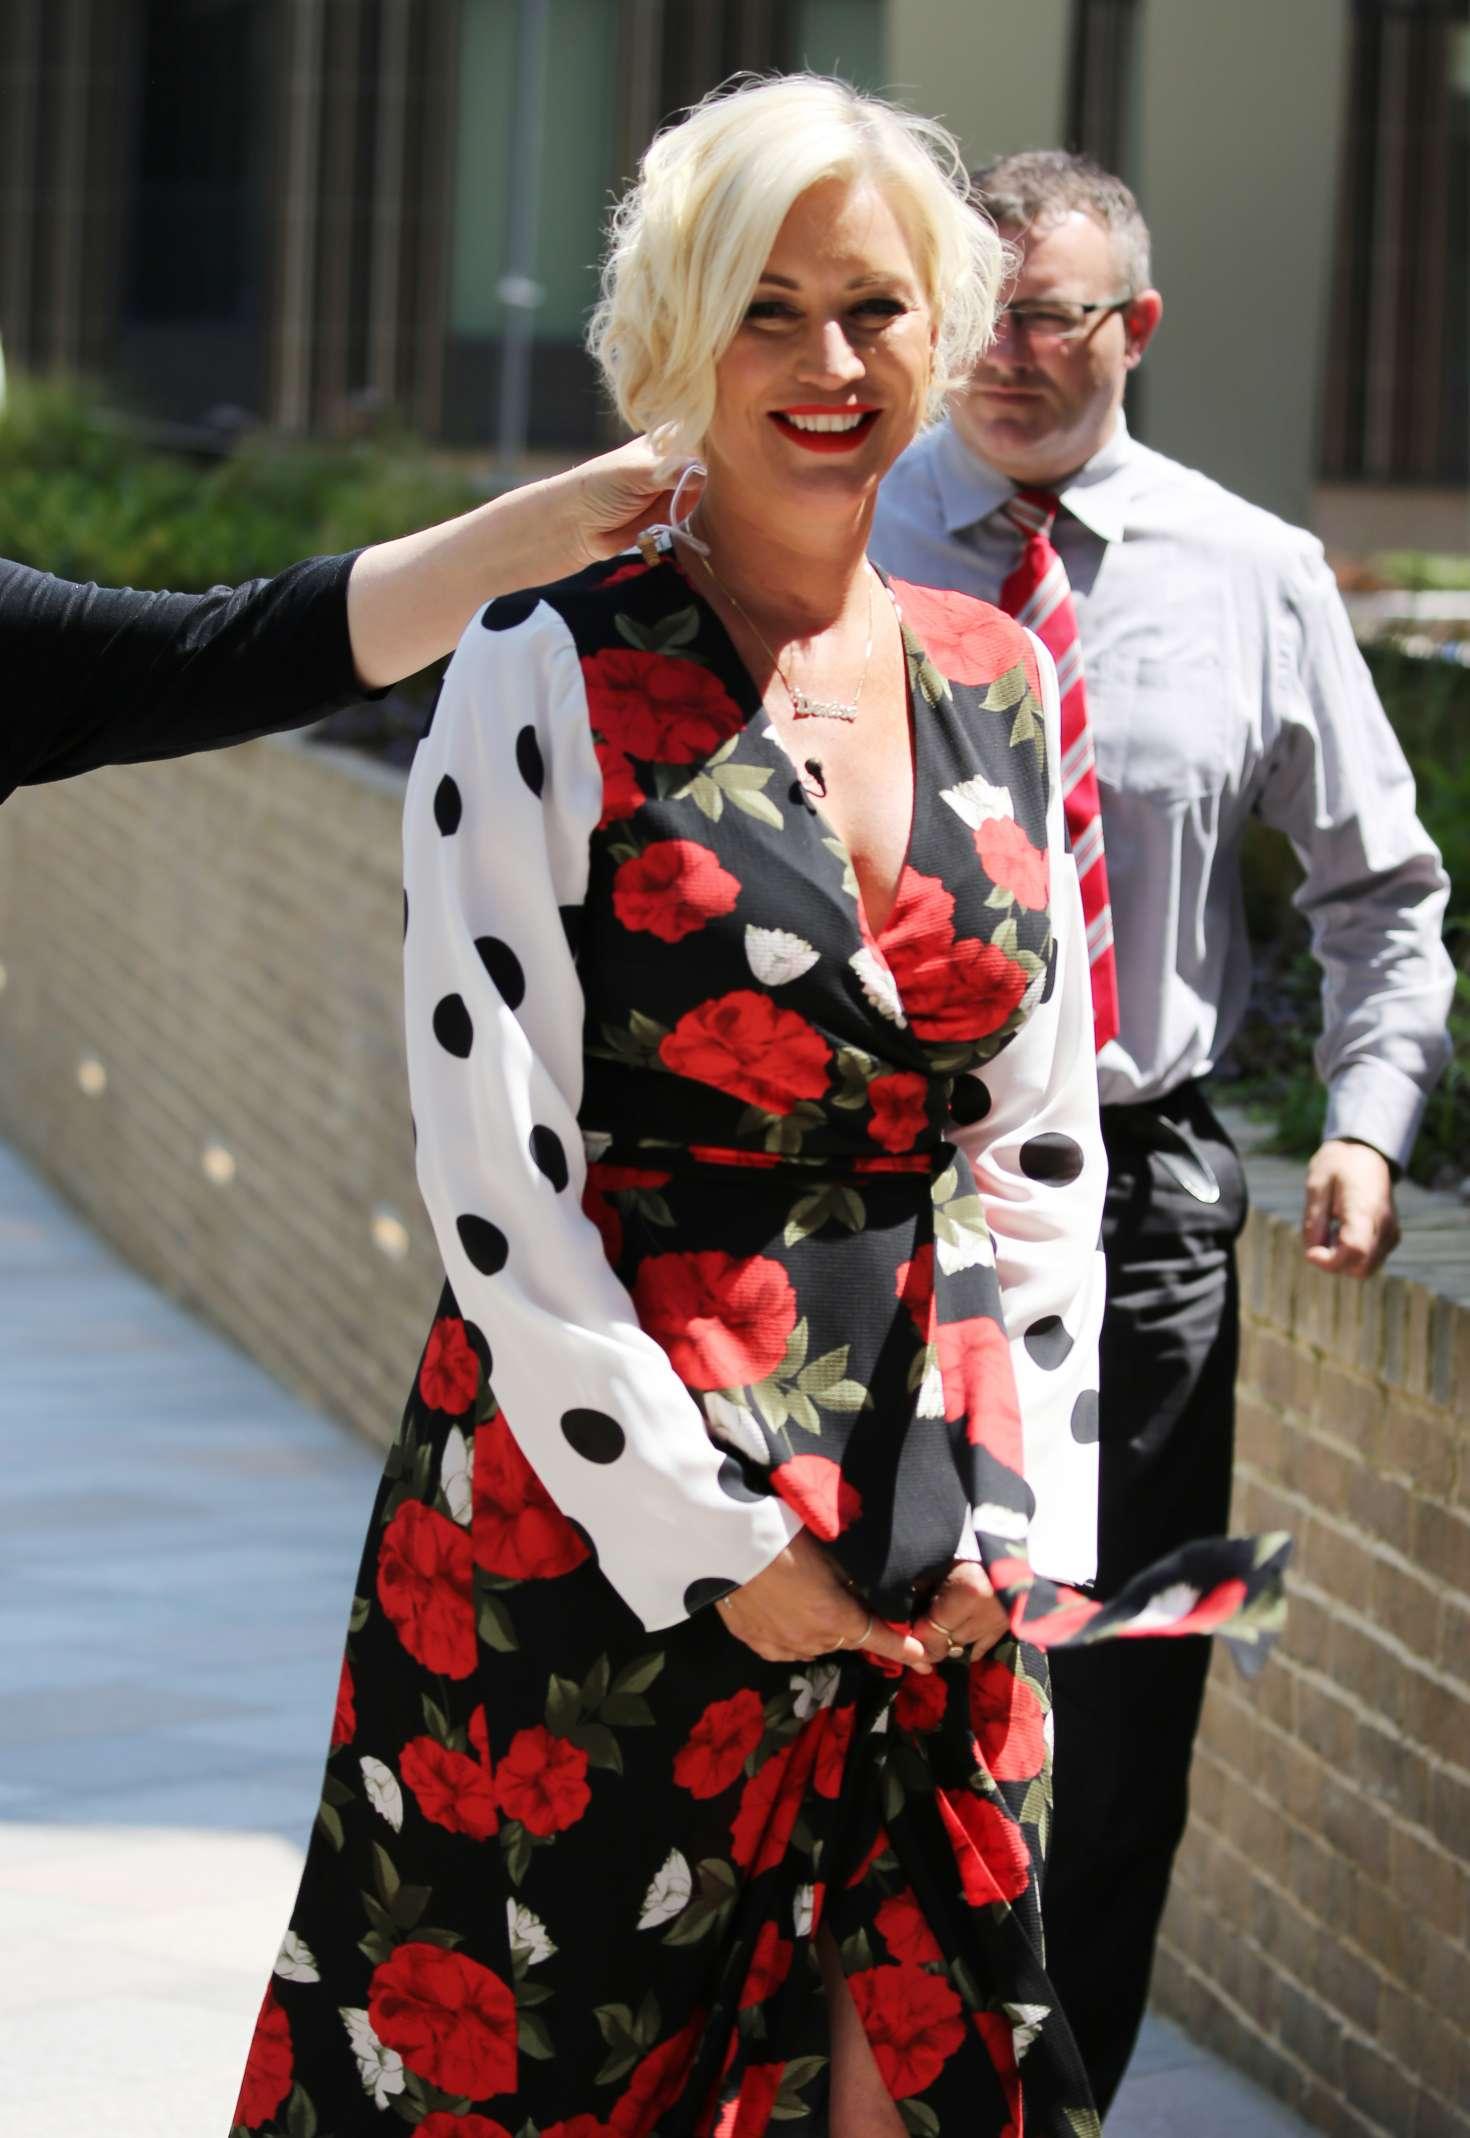 Denise Van Outen at ITV Studios in London